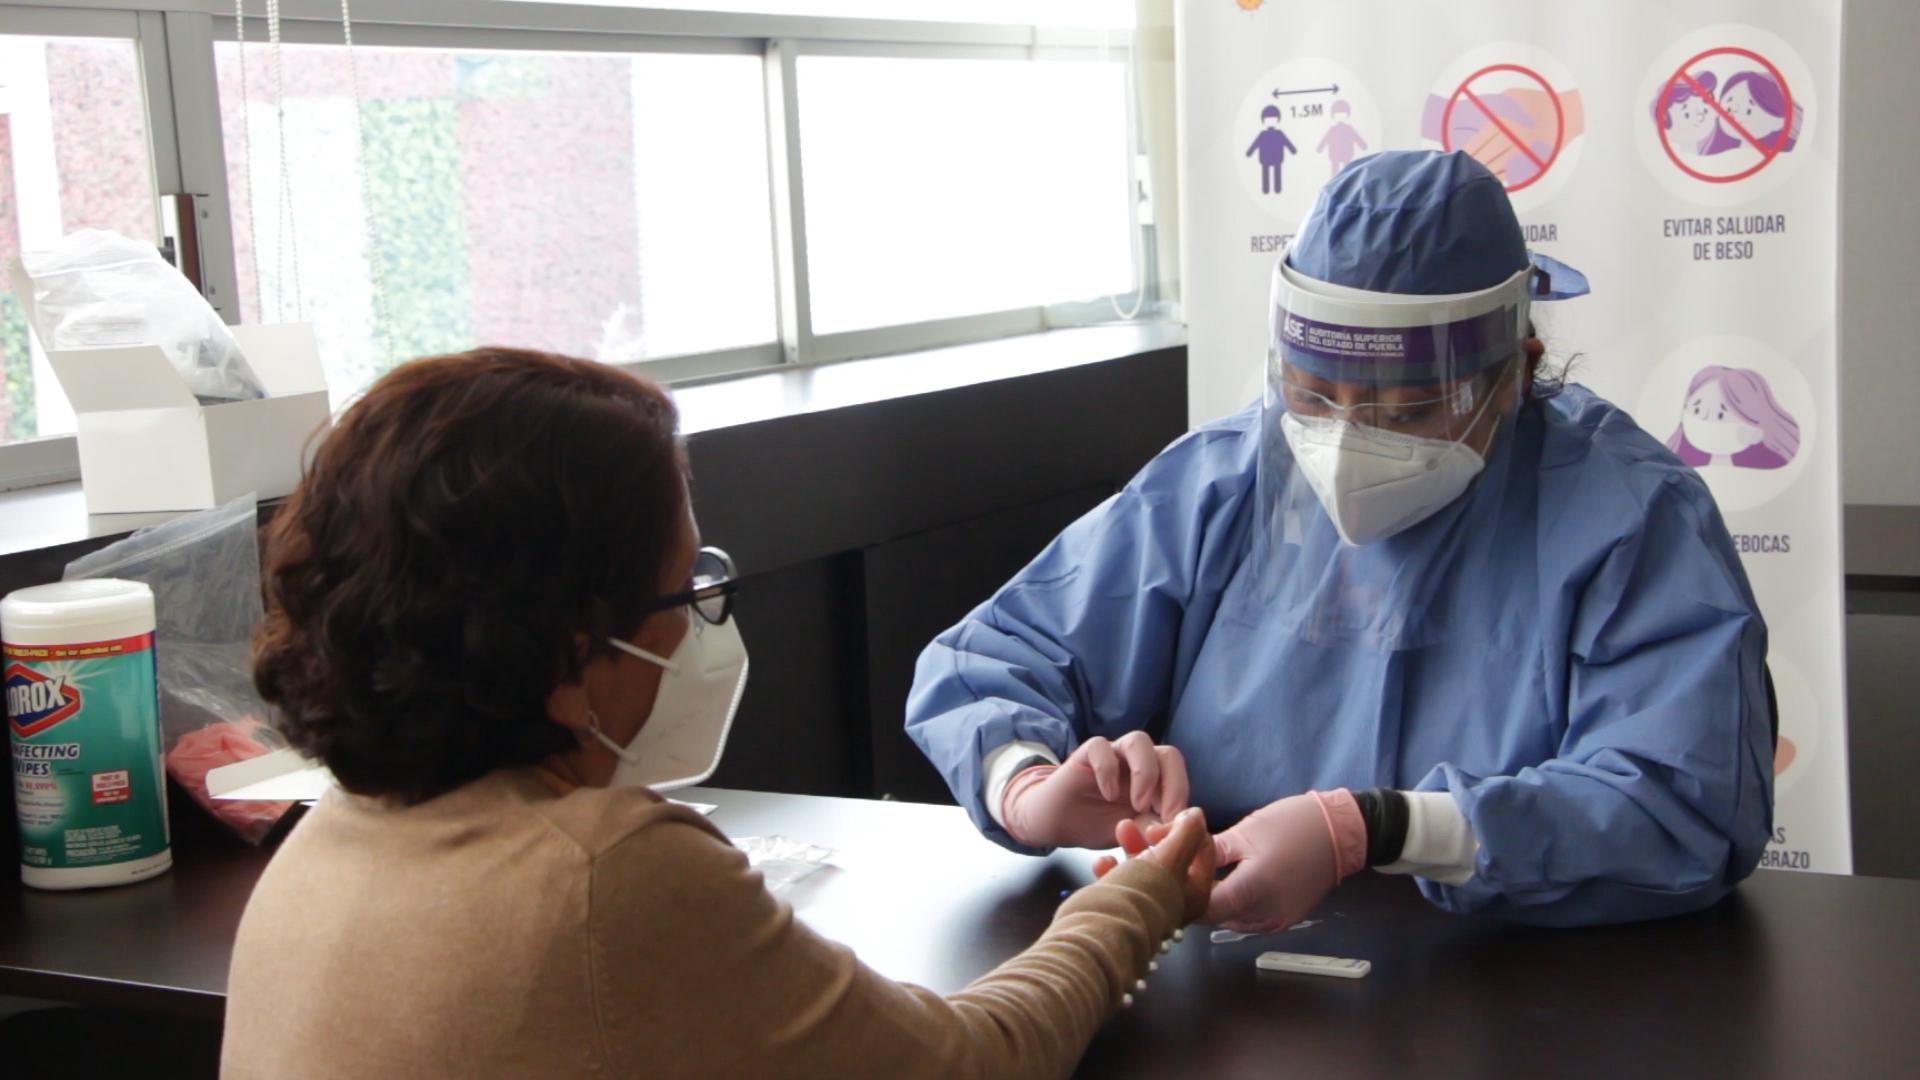 La ASE reforzó e incremento medidas para evitar contagios por COVID-19